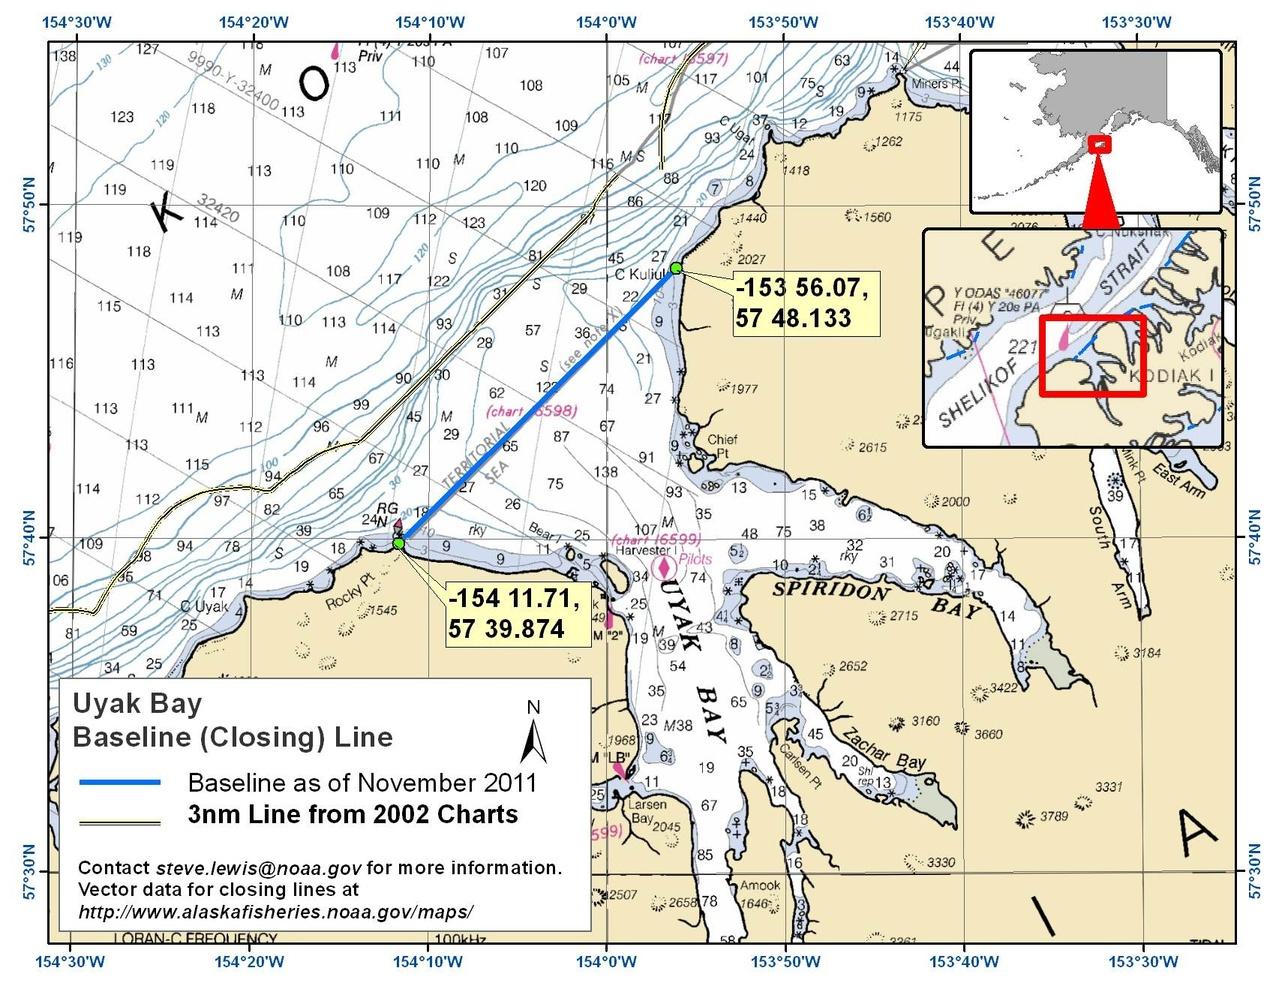 Chartlet for Uyak Bay